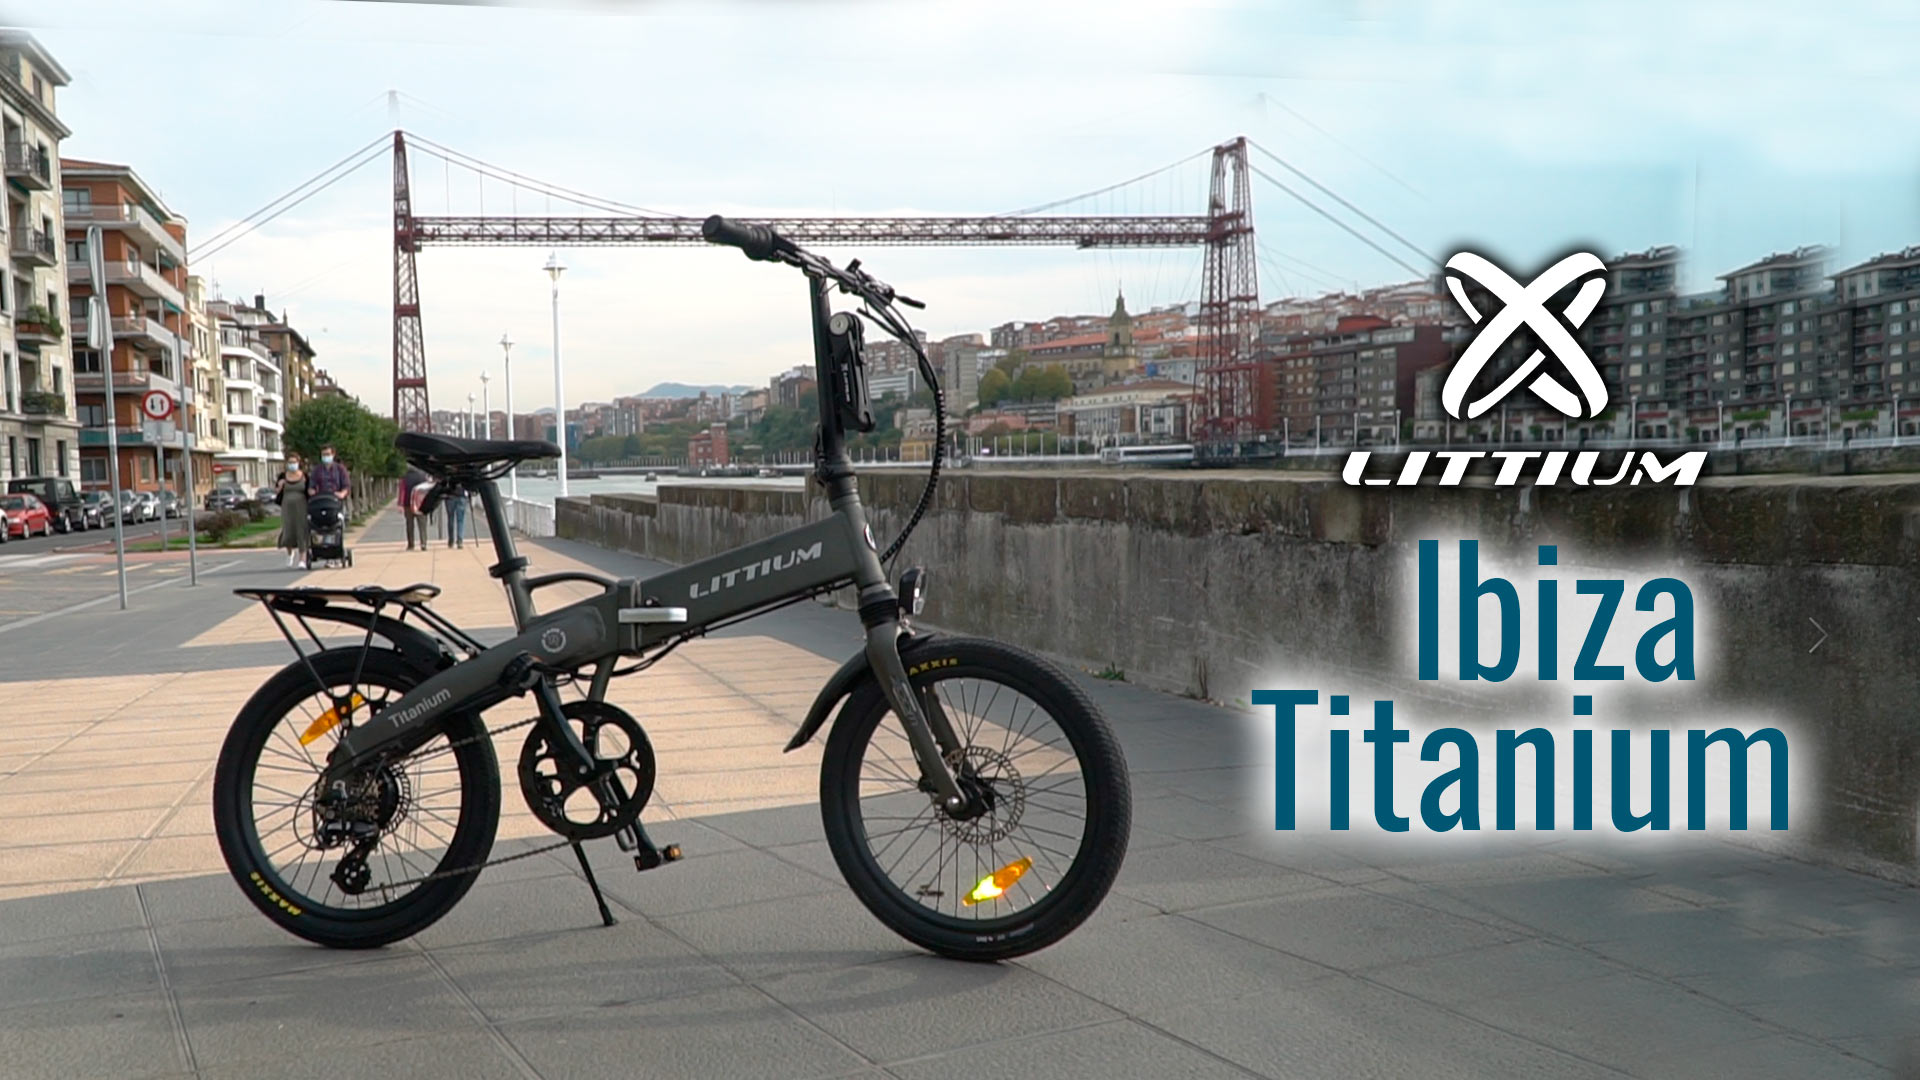 e-Bike Ibiza Titanium, tecnología y estilo propio